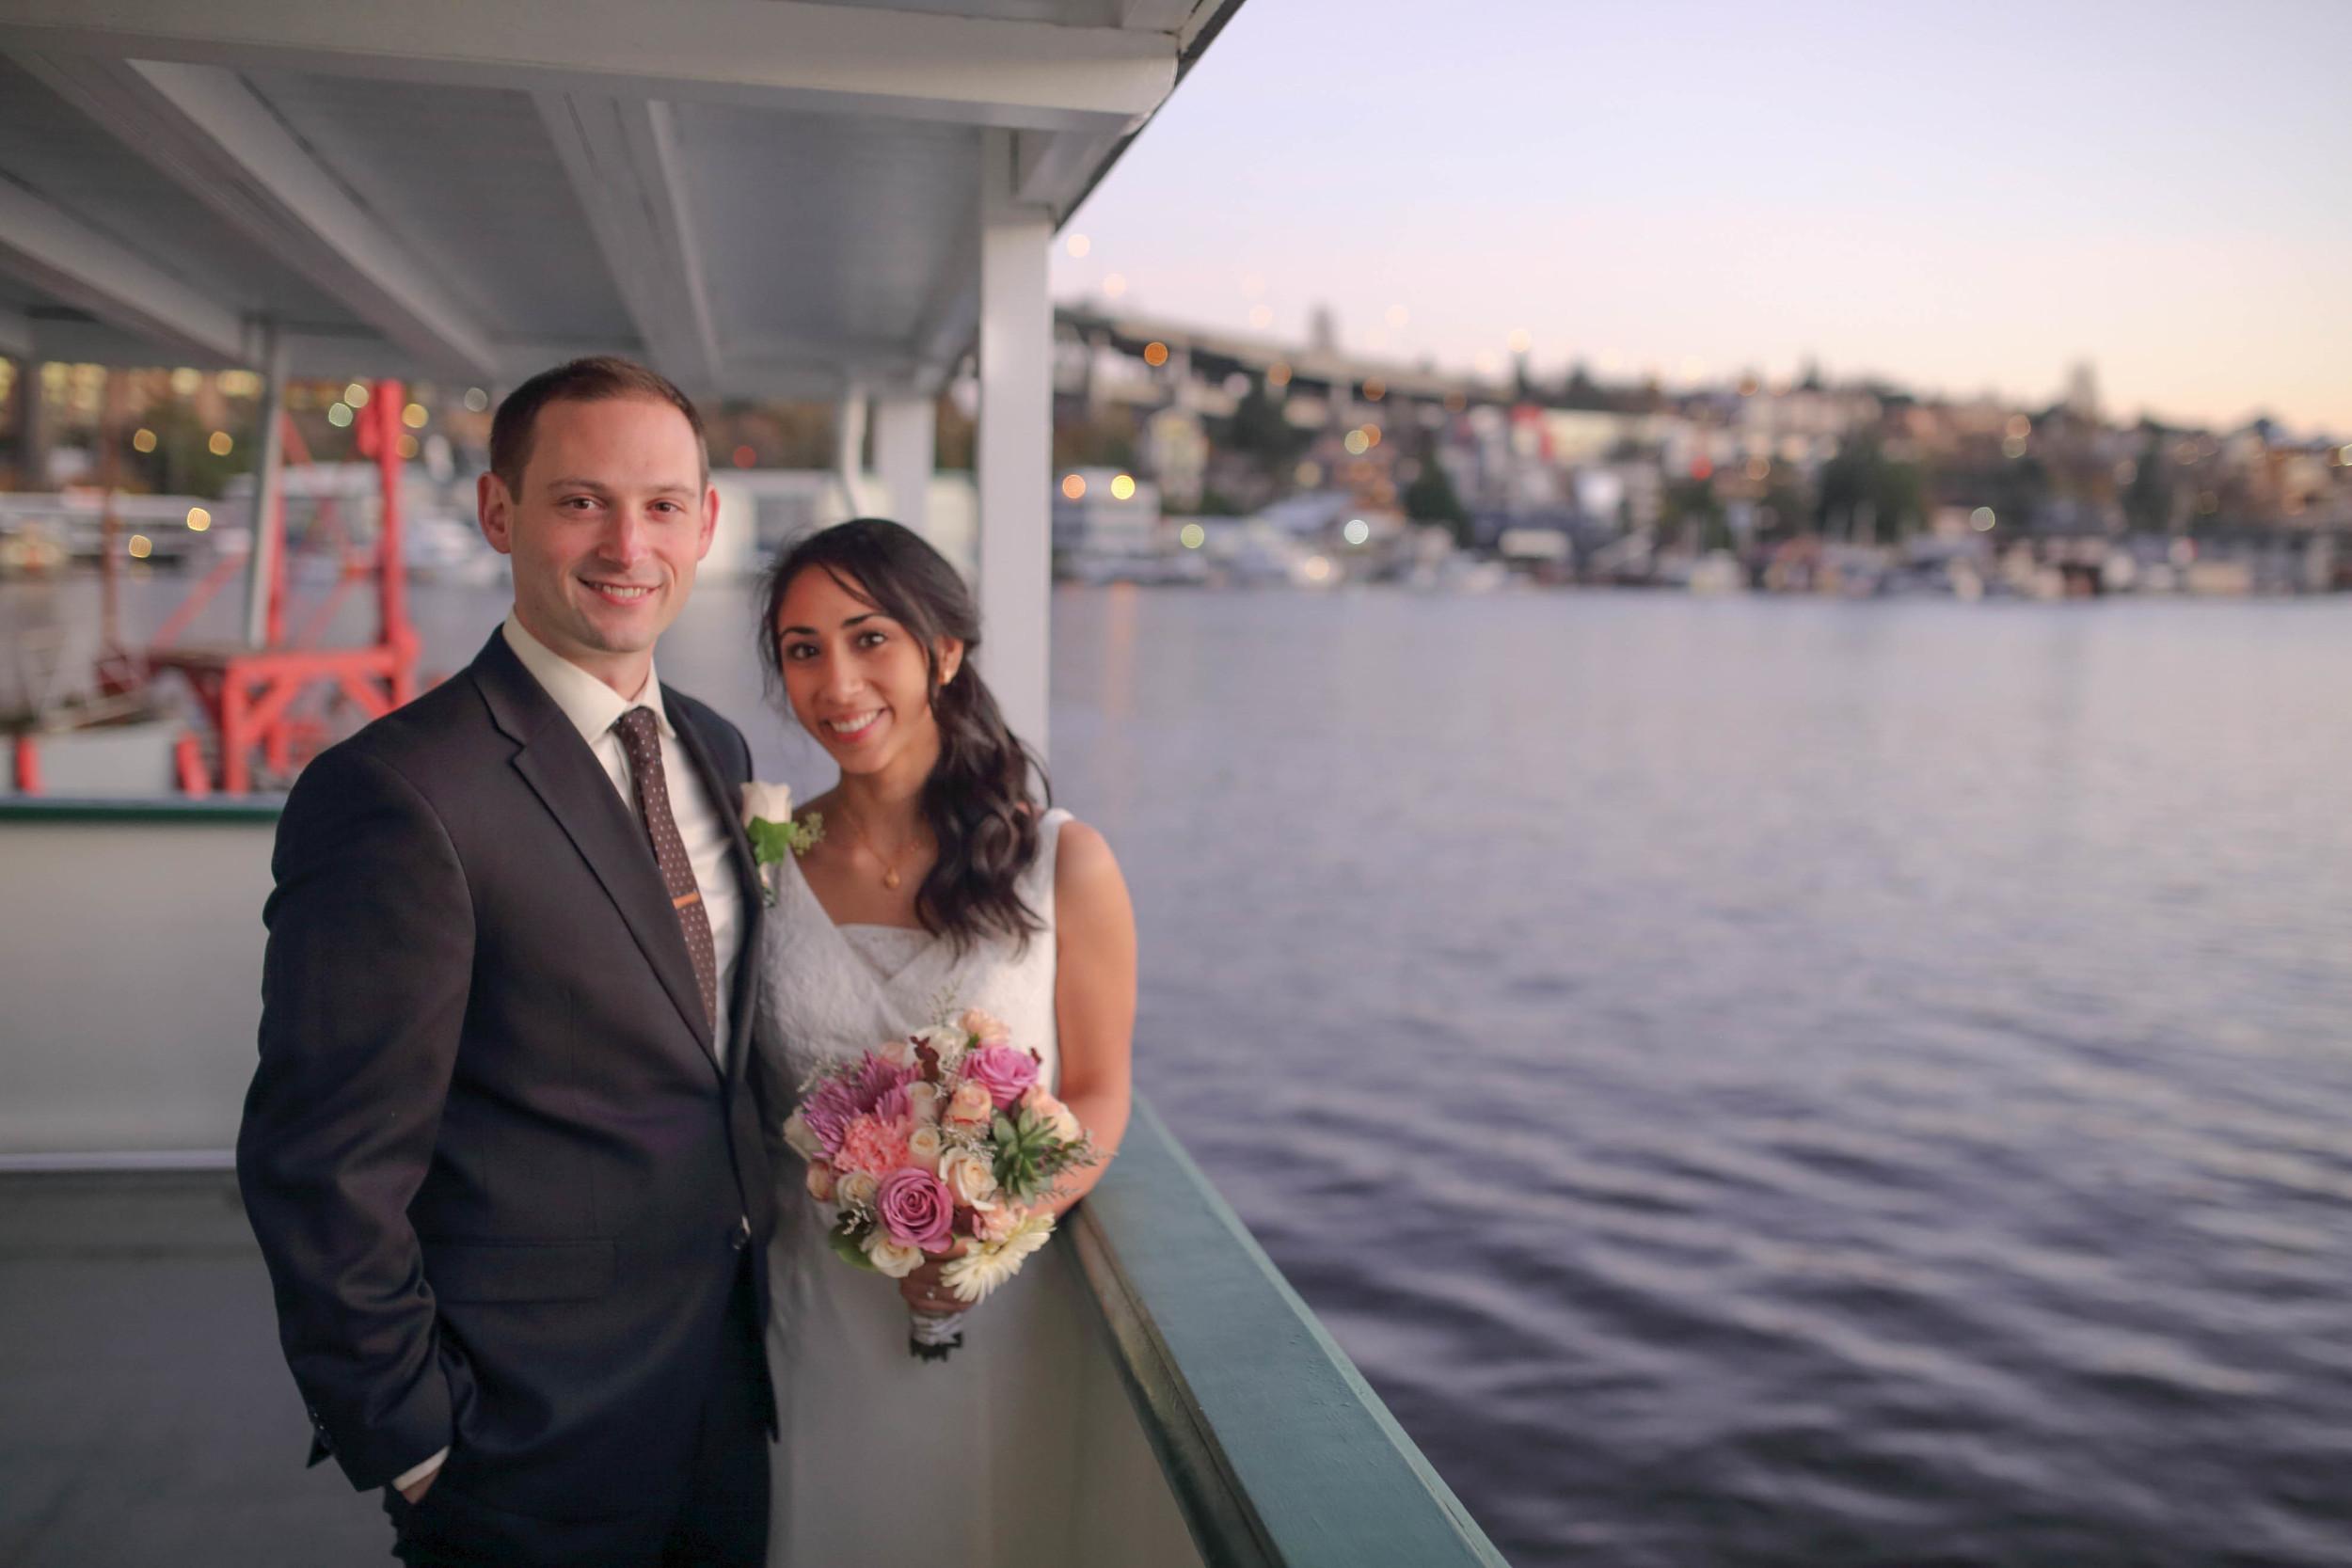 Wedding M-V Skansonia Seattle WA26.jpg